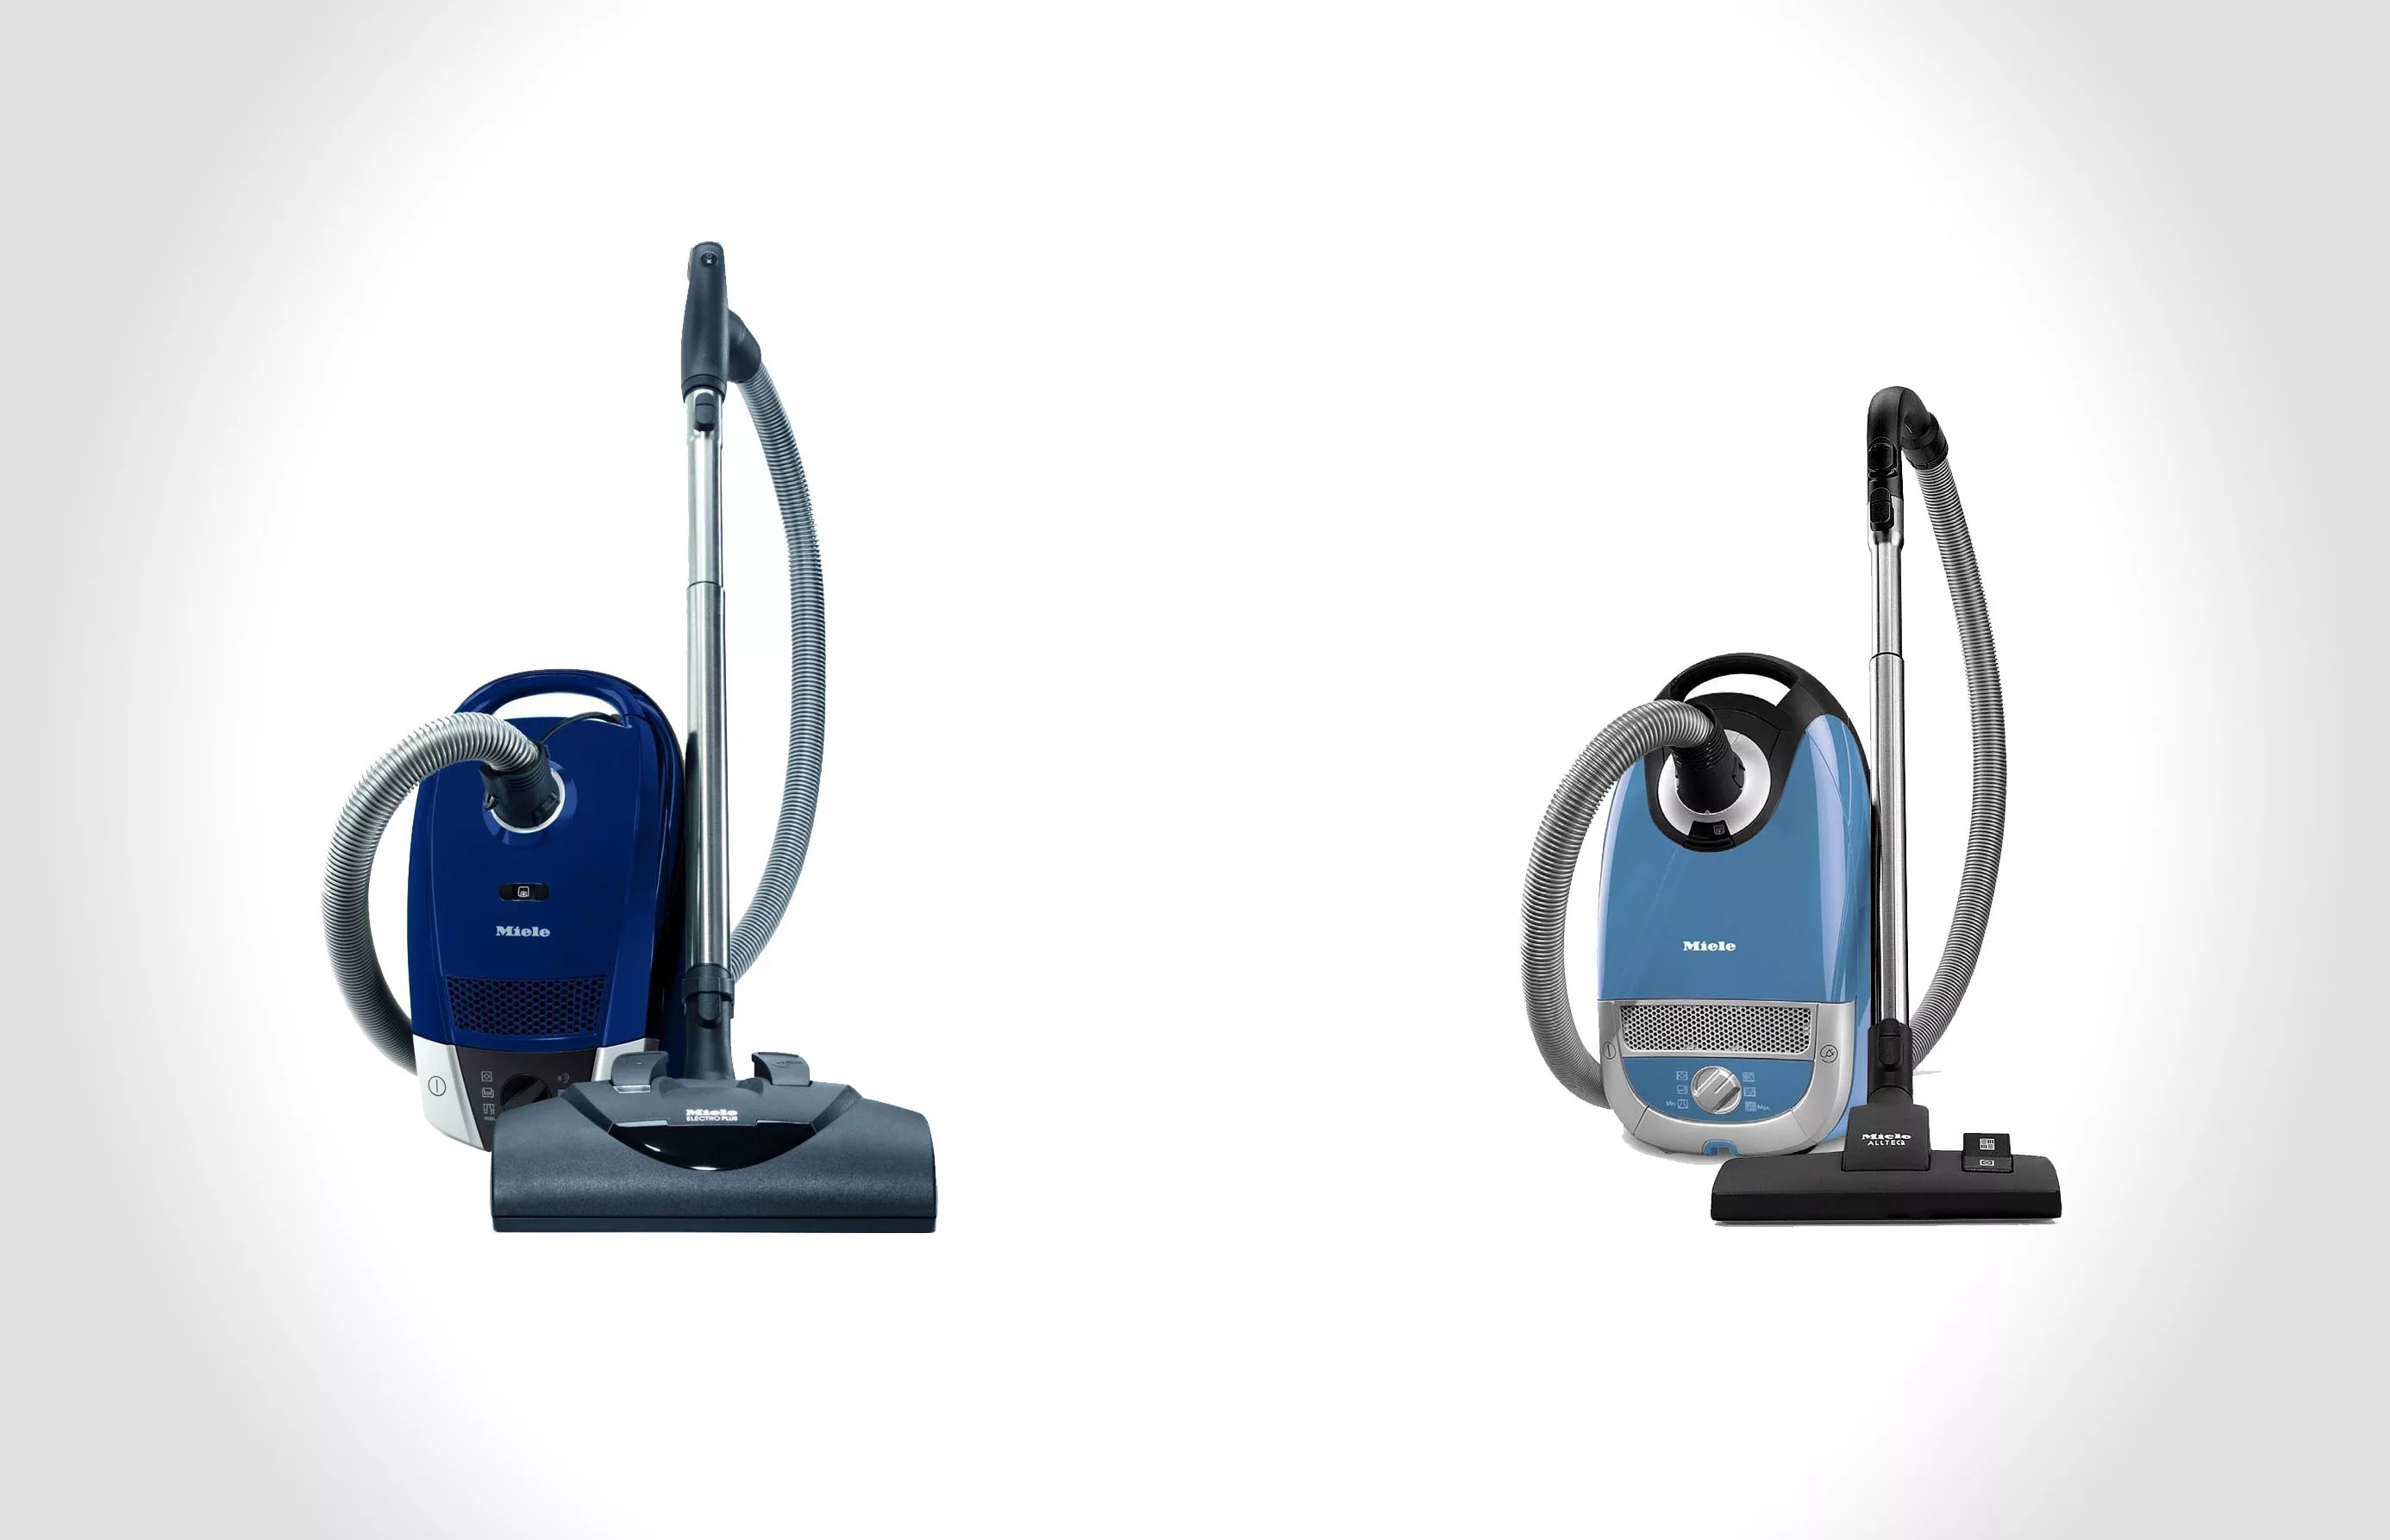 Miele Compact C2 Electro + PowerLine vs Miele Complete C2